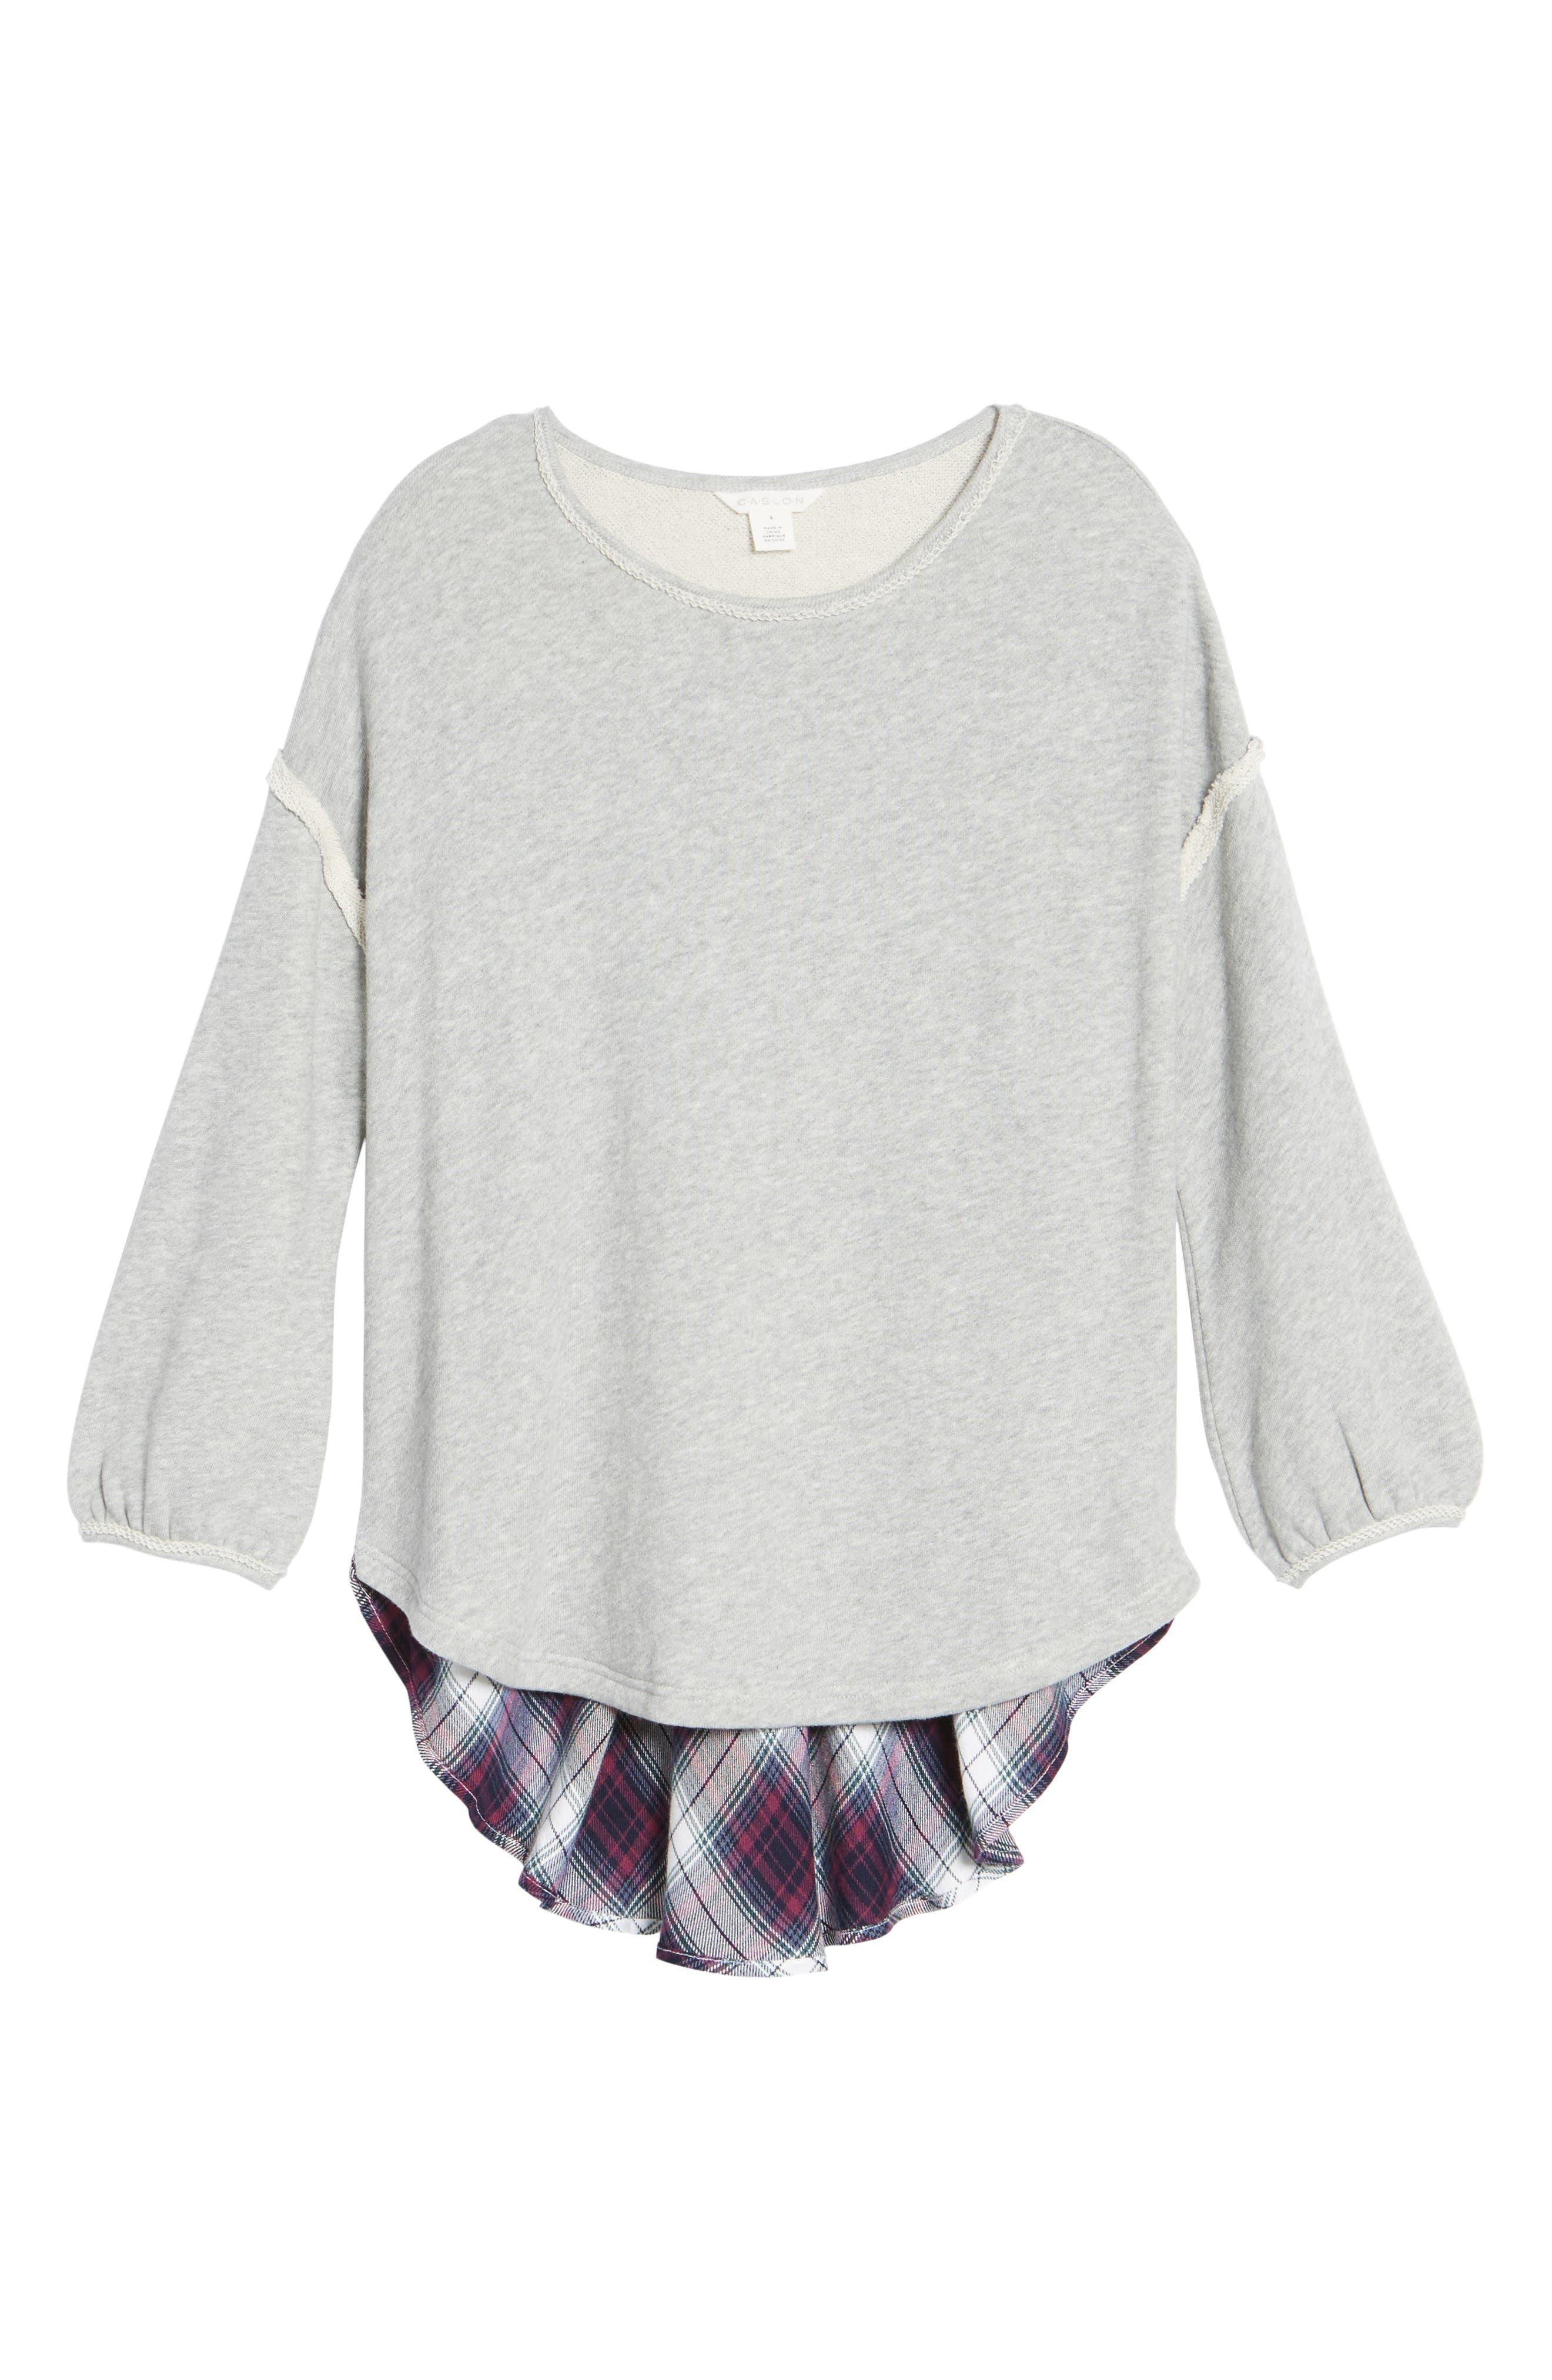 Layered Look Sweatshirt,                             Alternate thumbnail 6, color,                             021